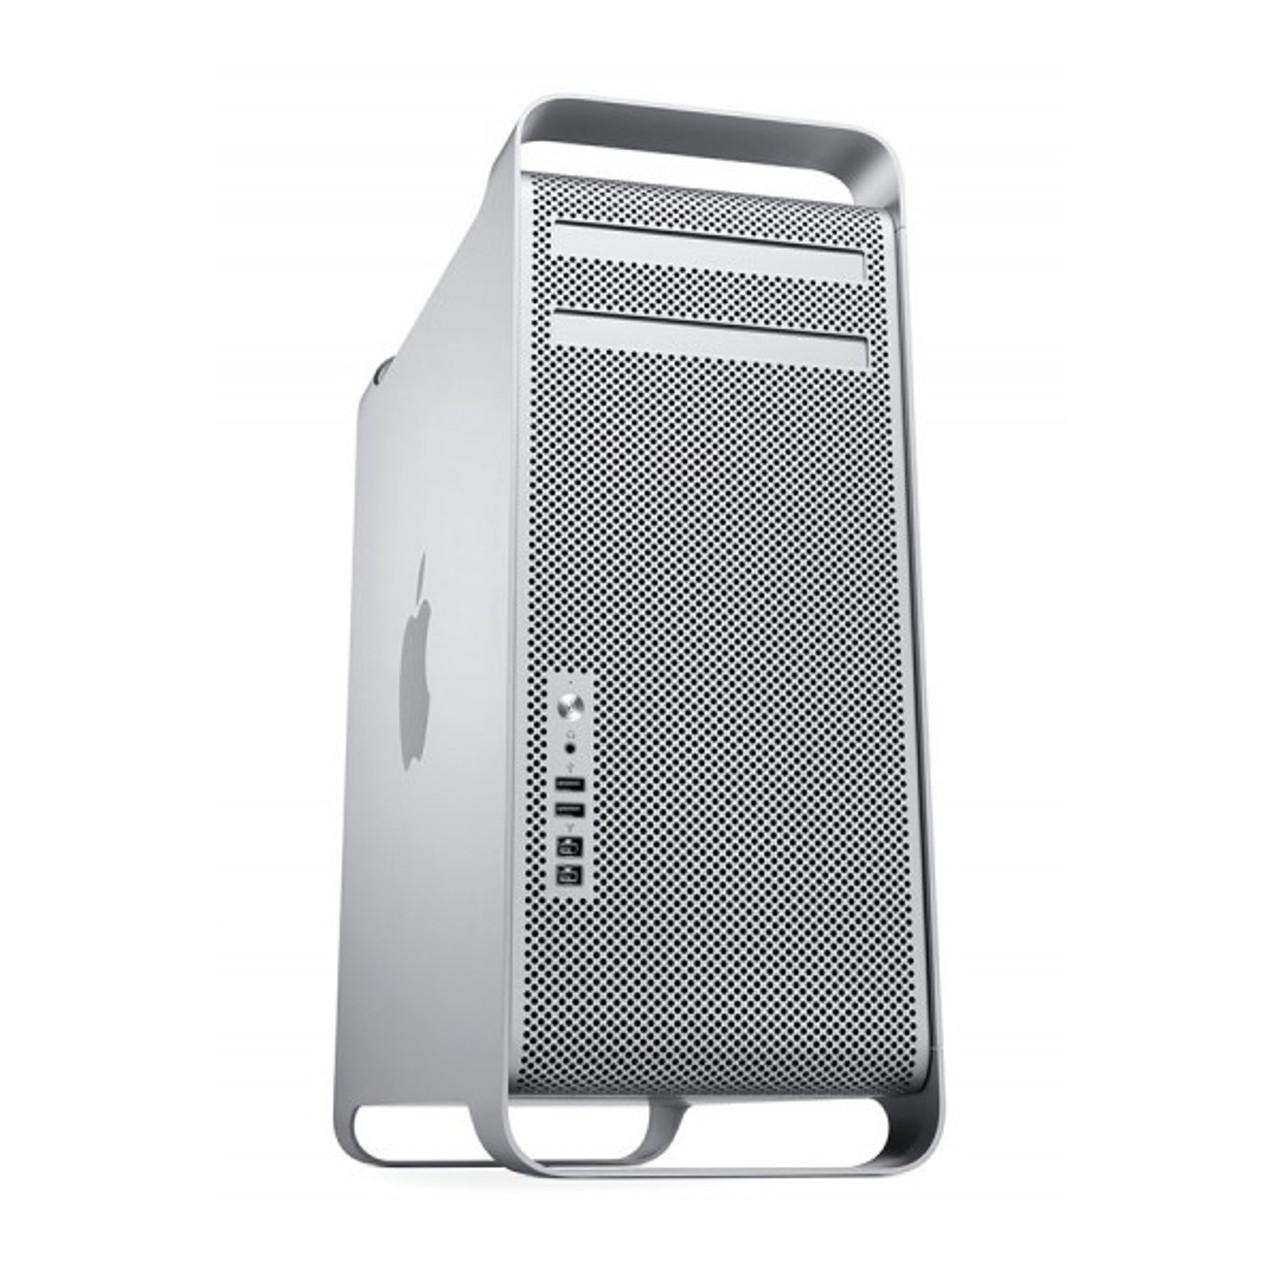 mac pro 2.93ghz 8 core